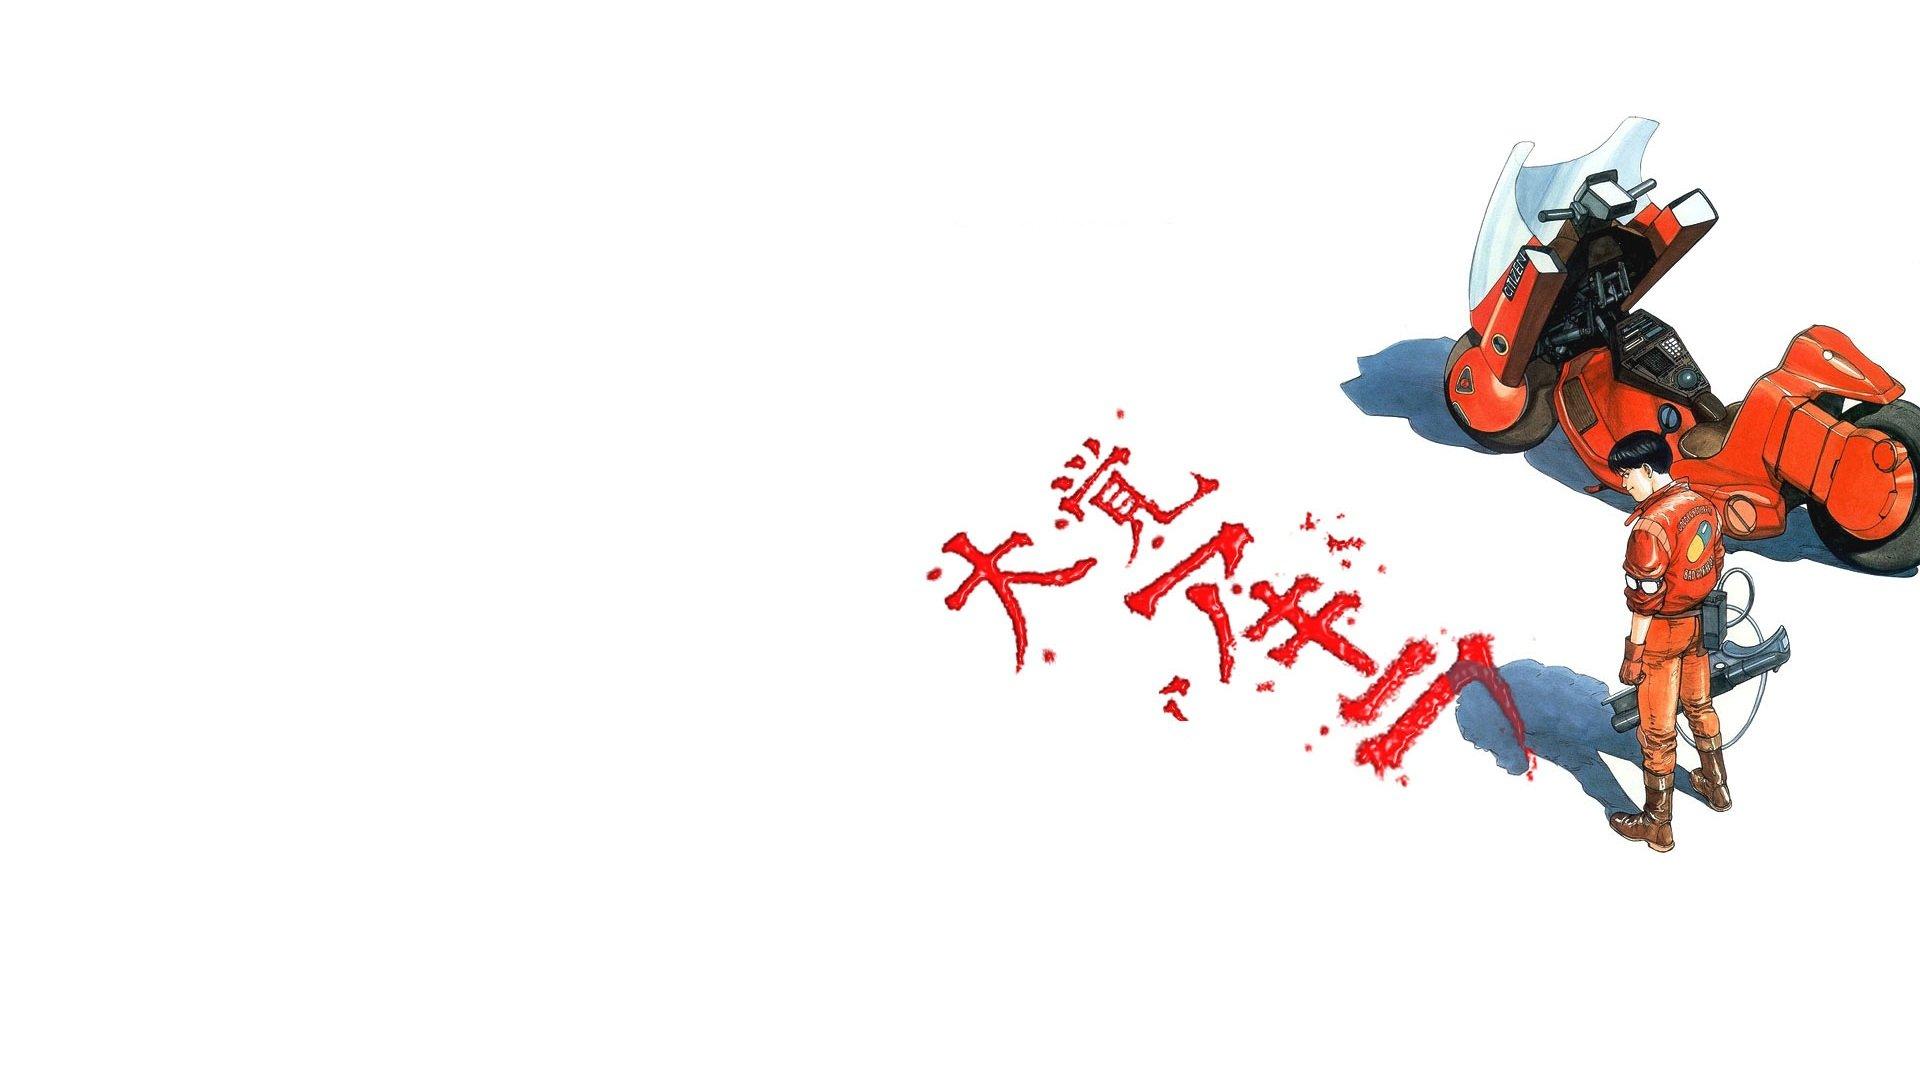 akira wallpaper 1920x1080 318531 wallpaperup